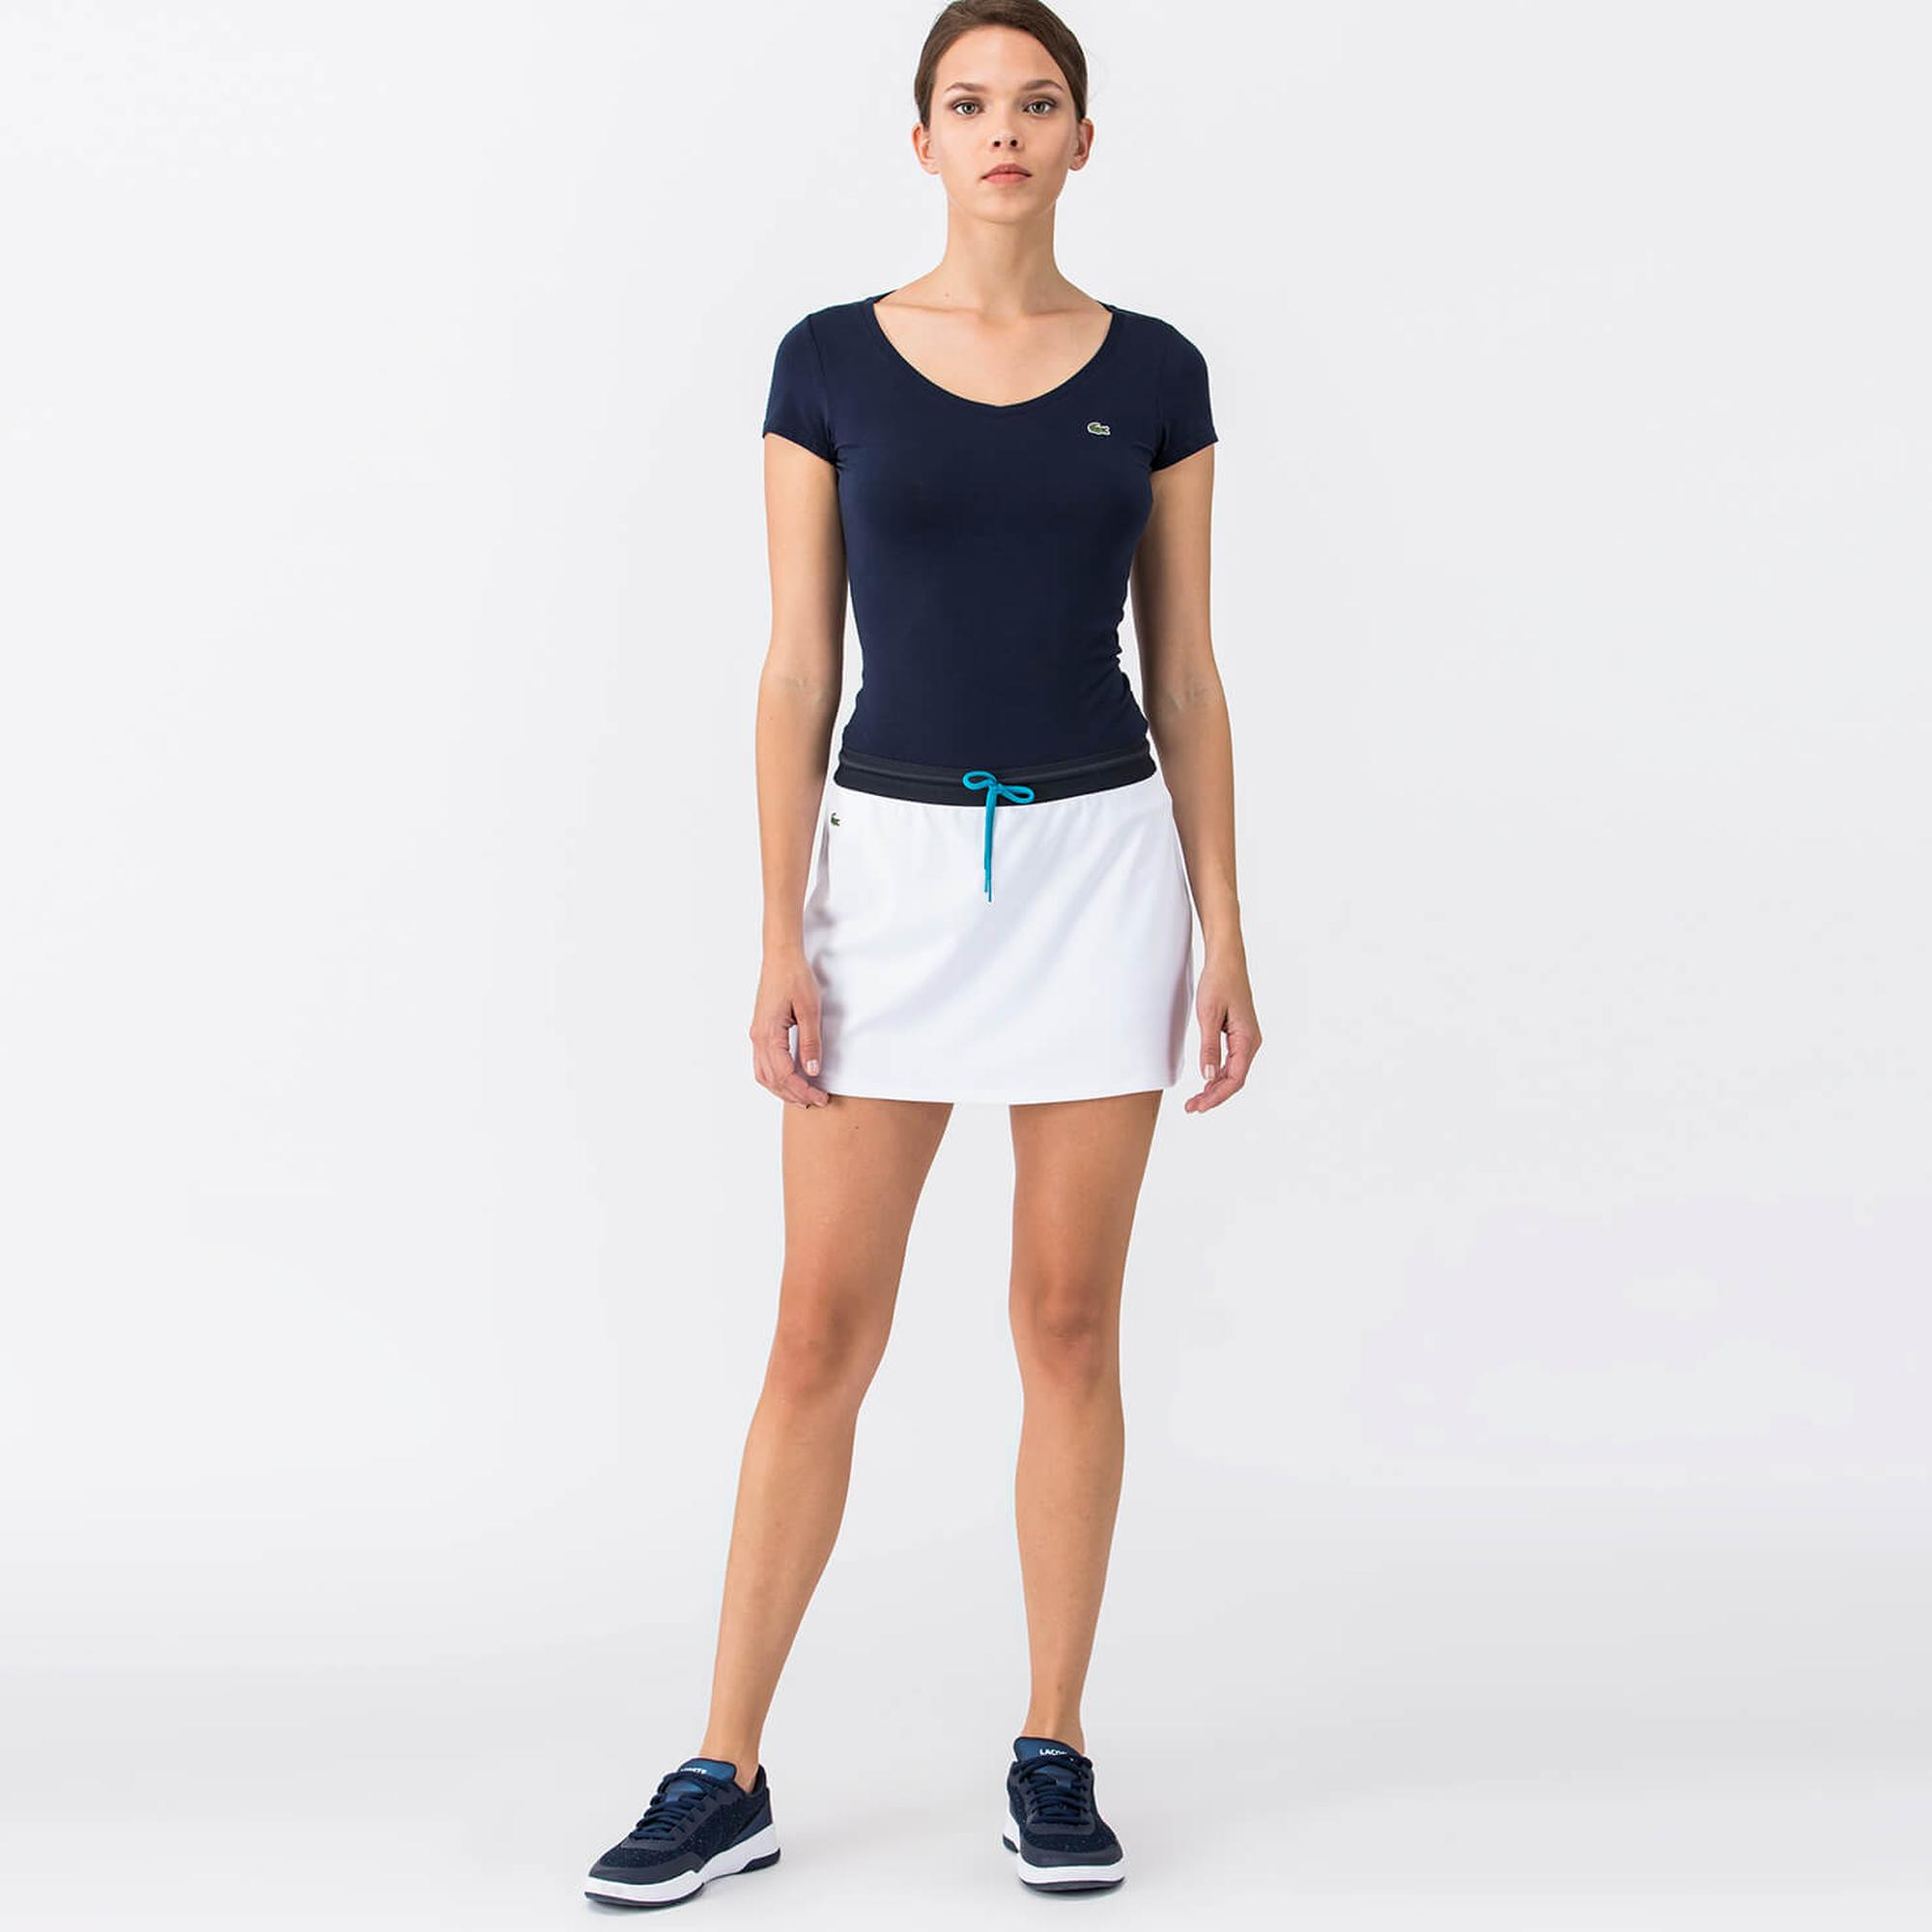 Lacoste Women's SPORT Tennis Jersey Skirt